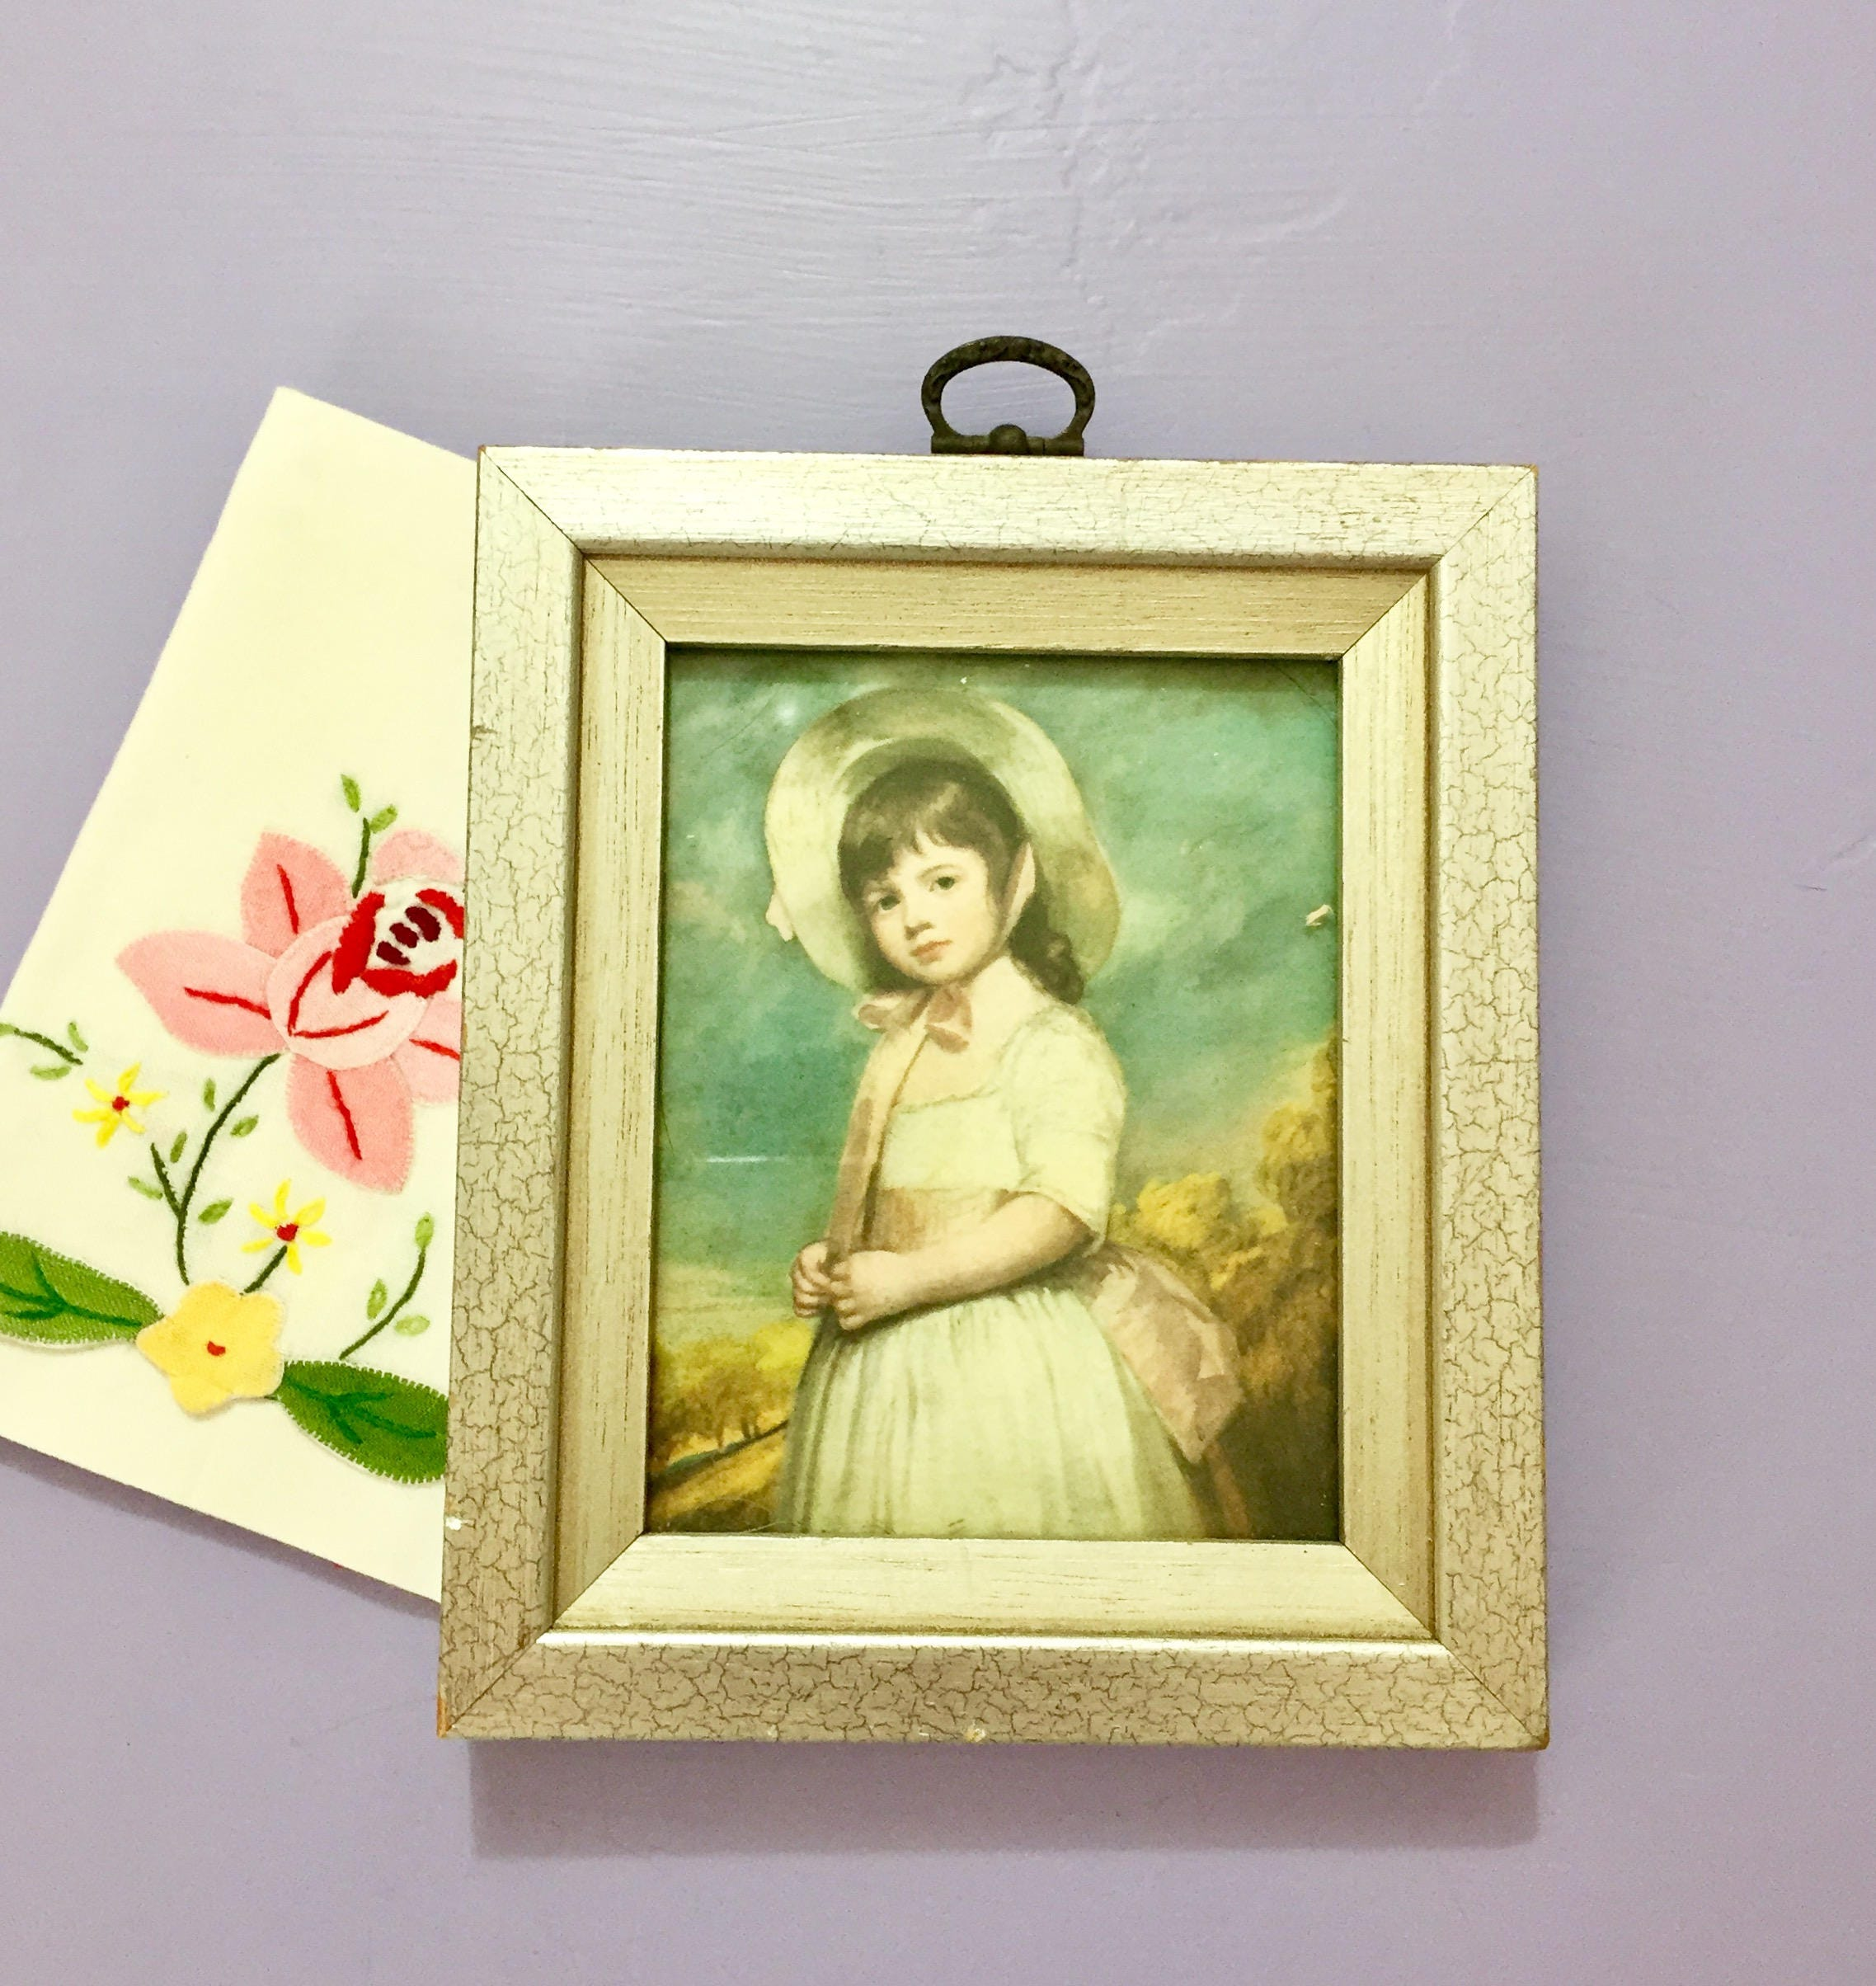 Vintage Edwardian Little Girl Portrait Print, Glass Framed Miniature ...